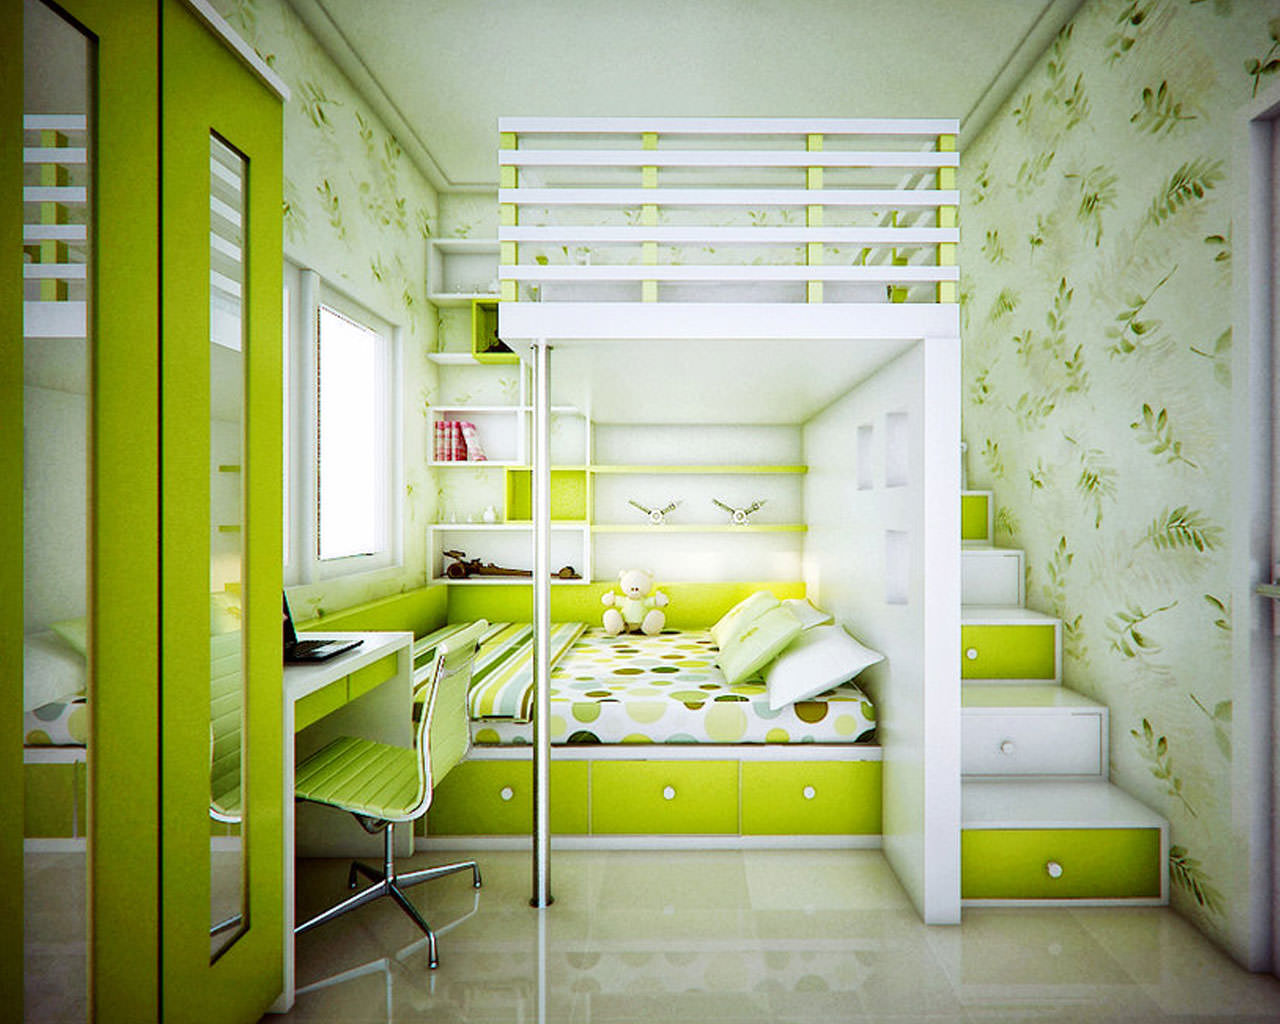 Green room interior design home designs design trends for Room design green